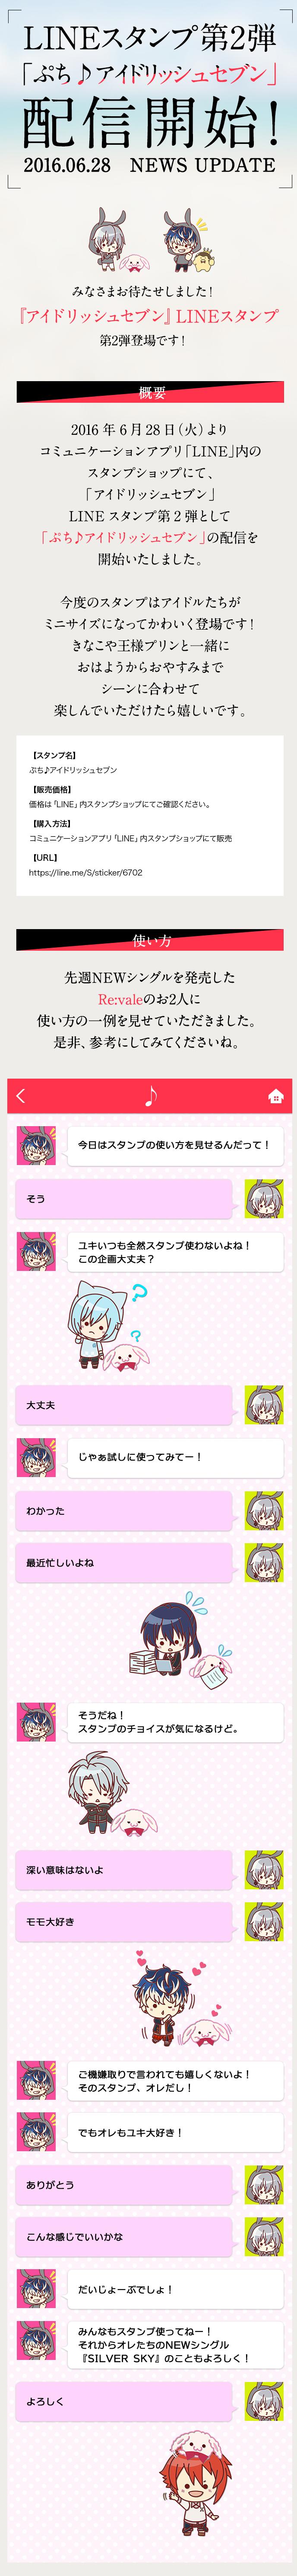 line_stamp_vol02_3